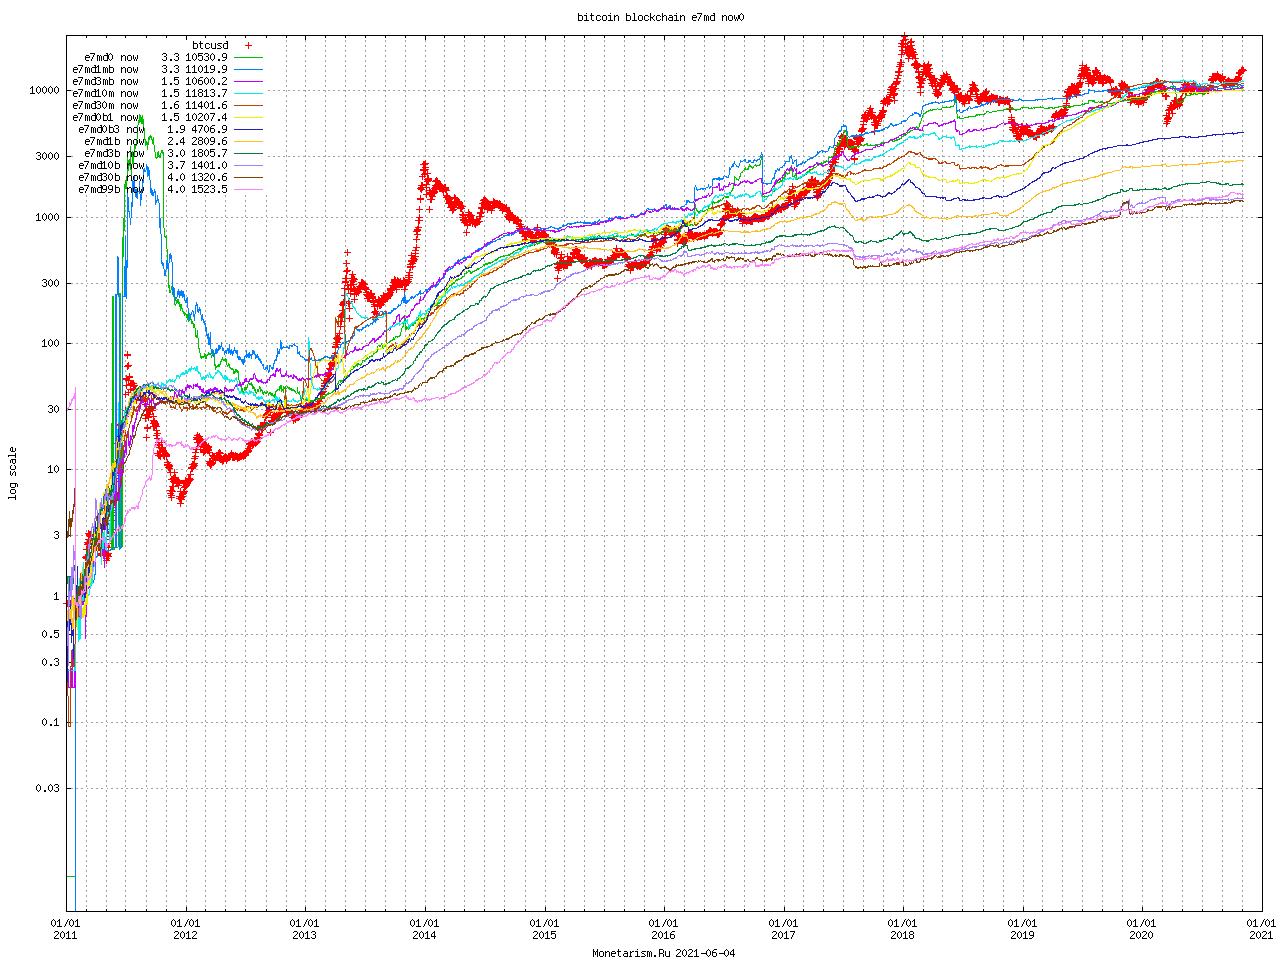 Bitcoin Blockchain e7md now0